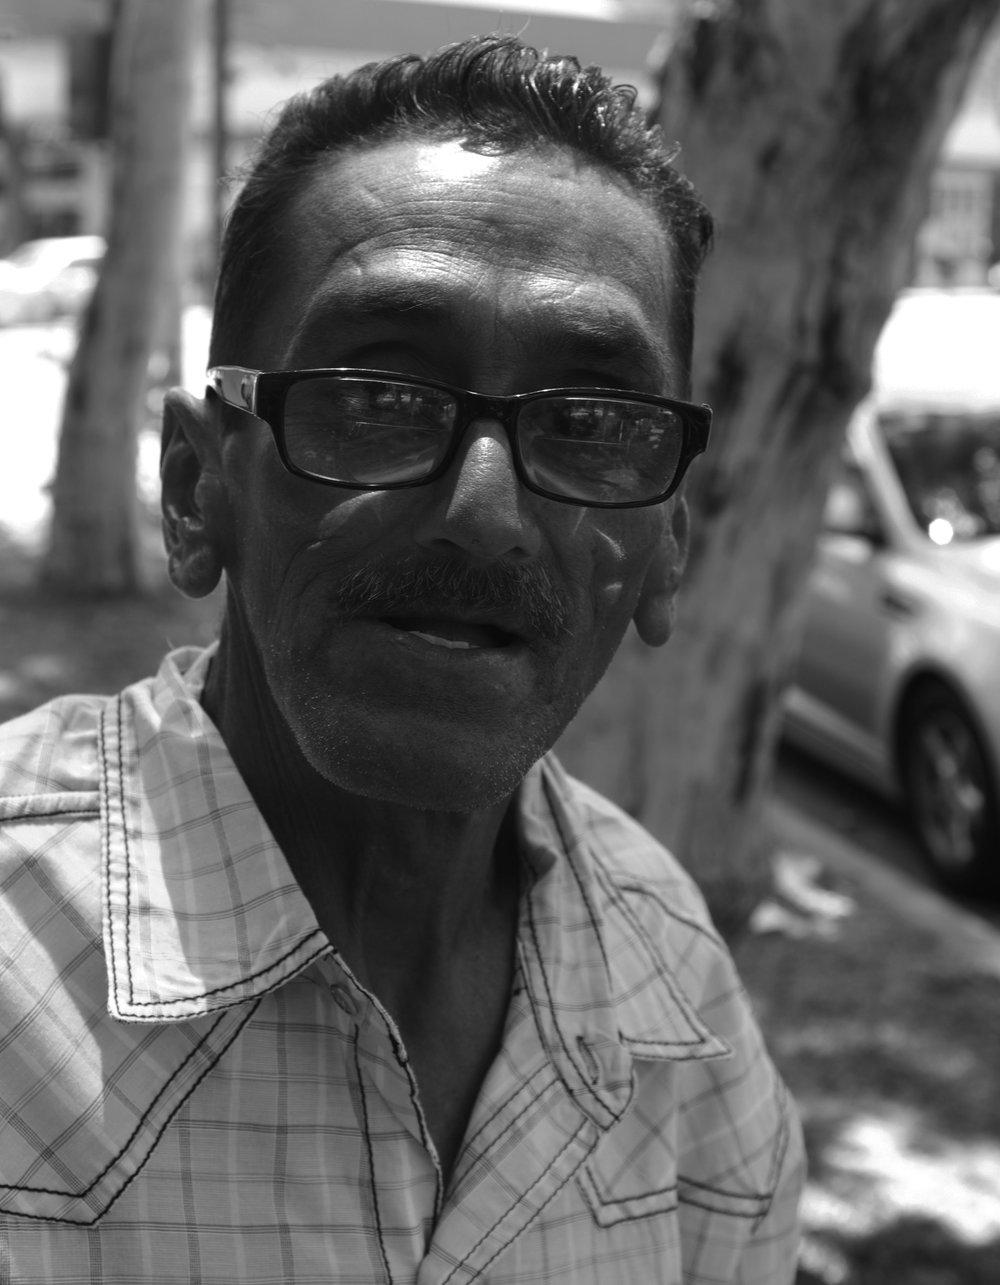 Man on Street 8 5 16.jpg